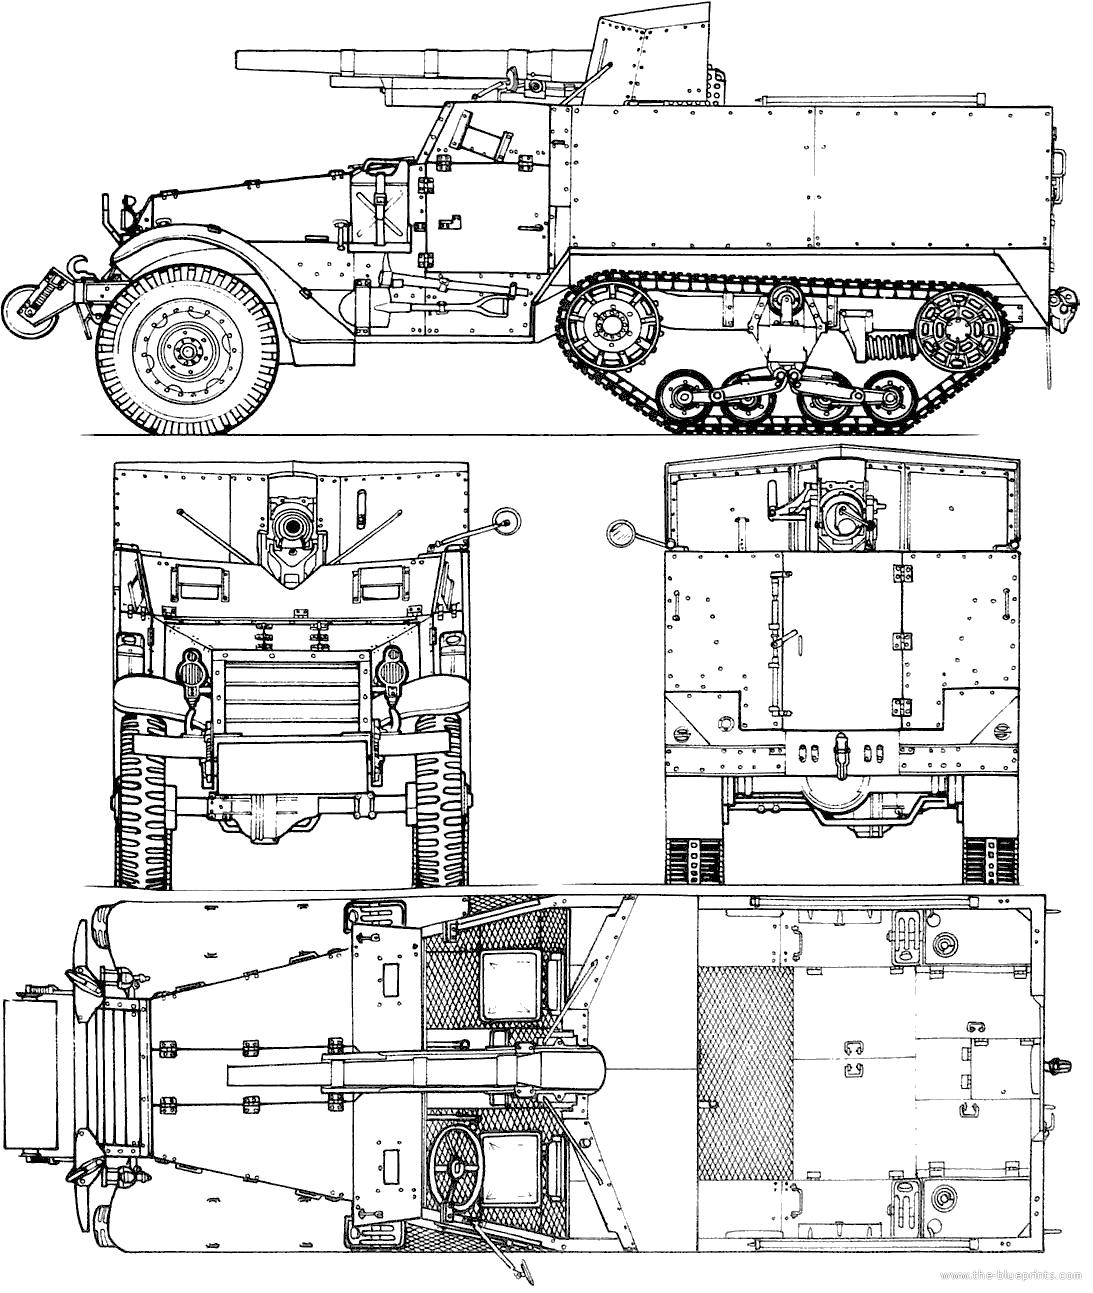 Blueprints Gt Tanks Gt Tanks M Gt M3 75mm Gun Motor Carriage